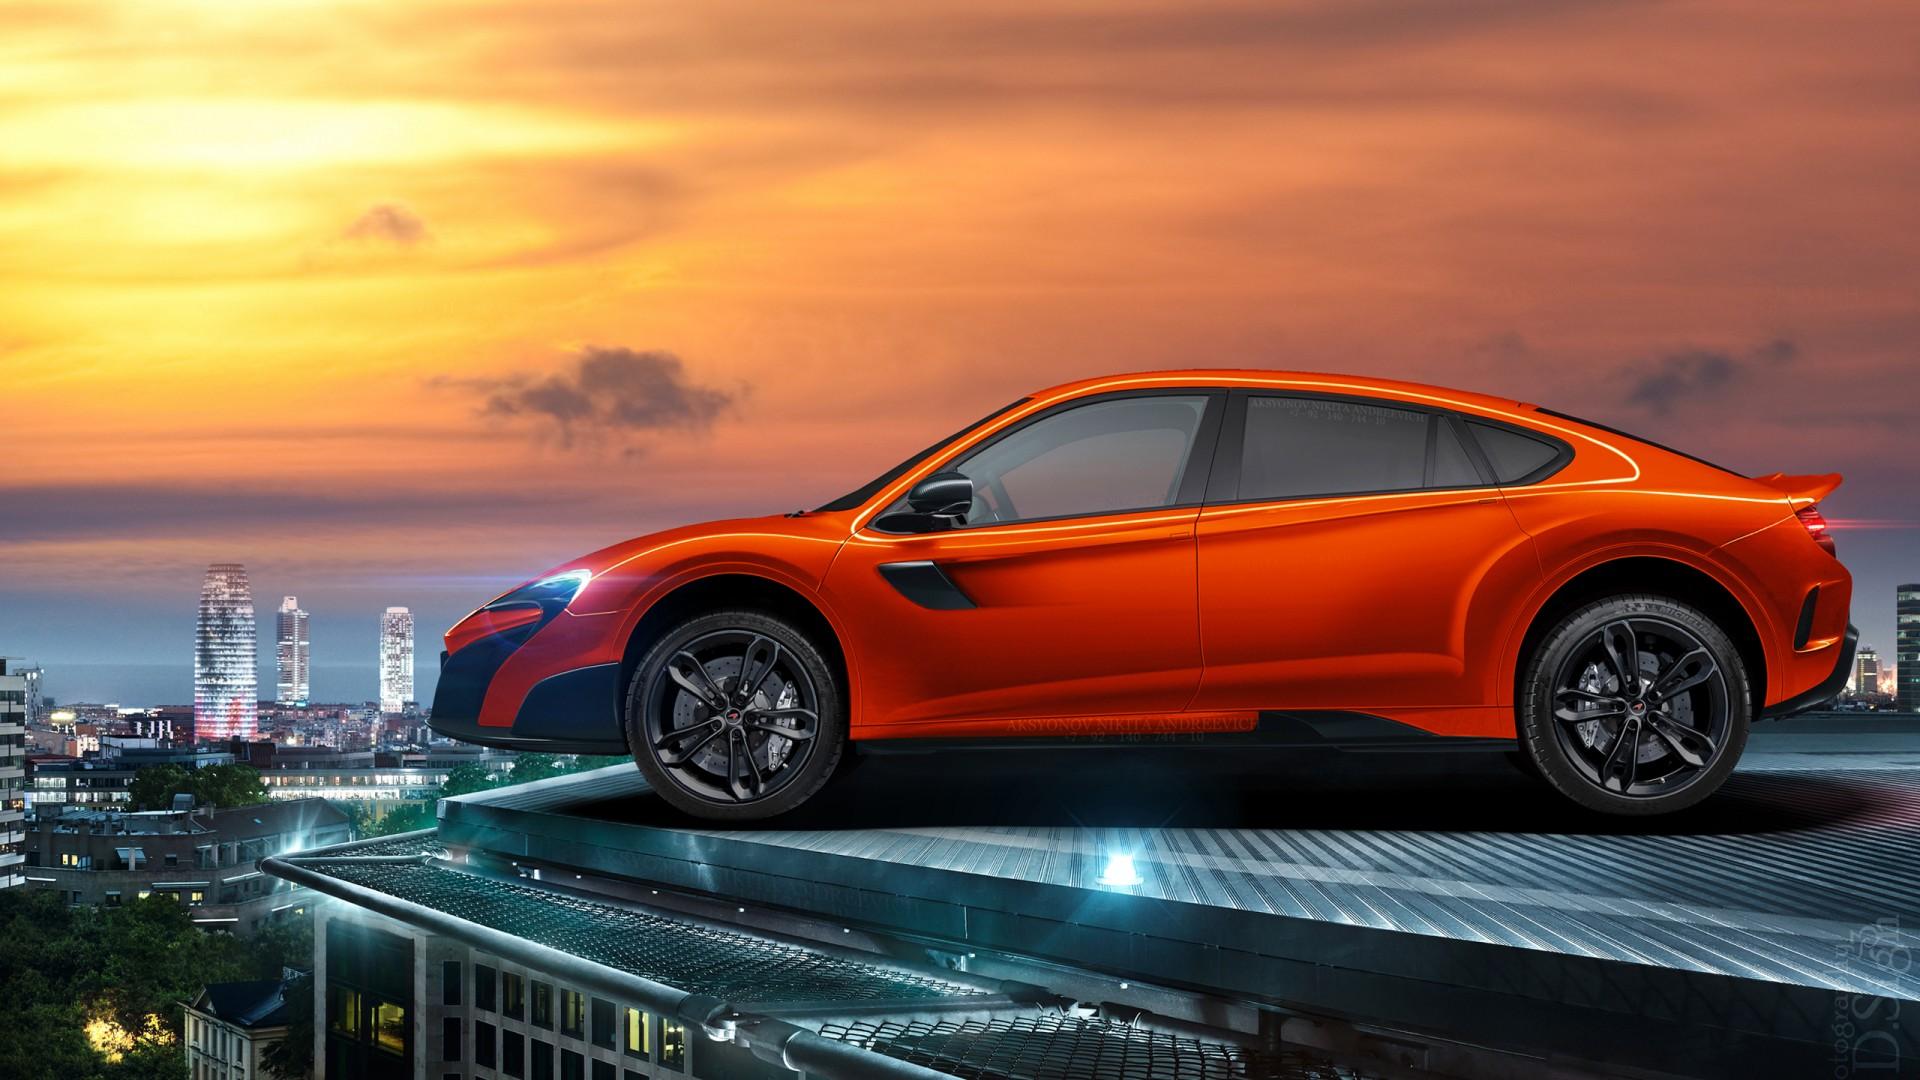 McLaren Super SUV Wallpaper